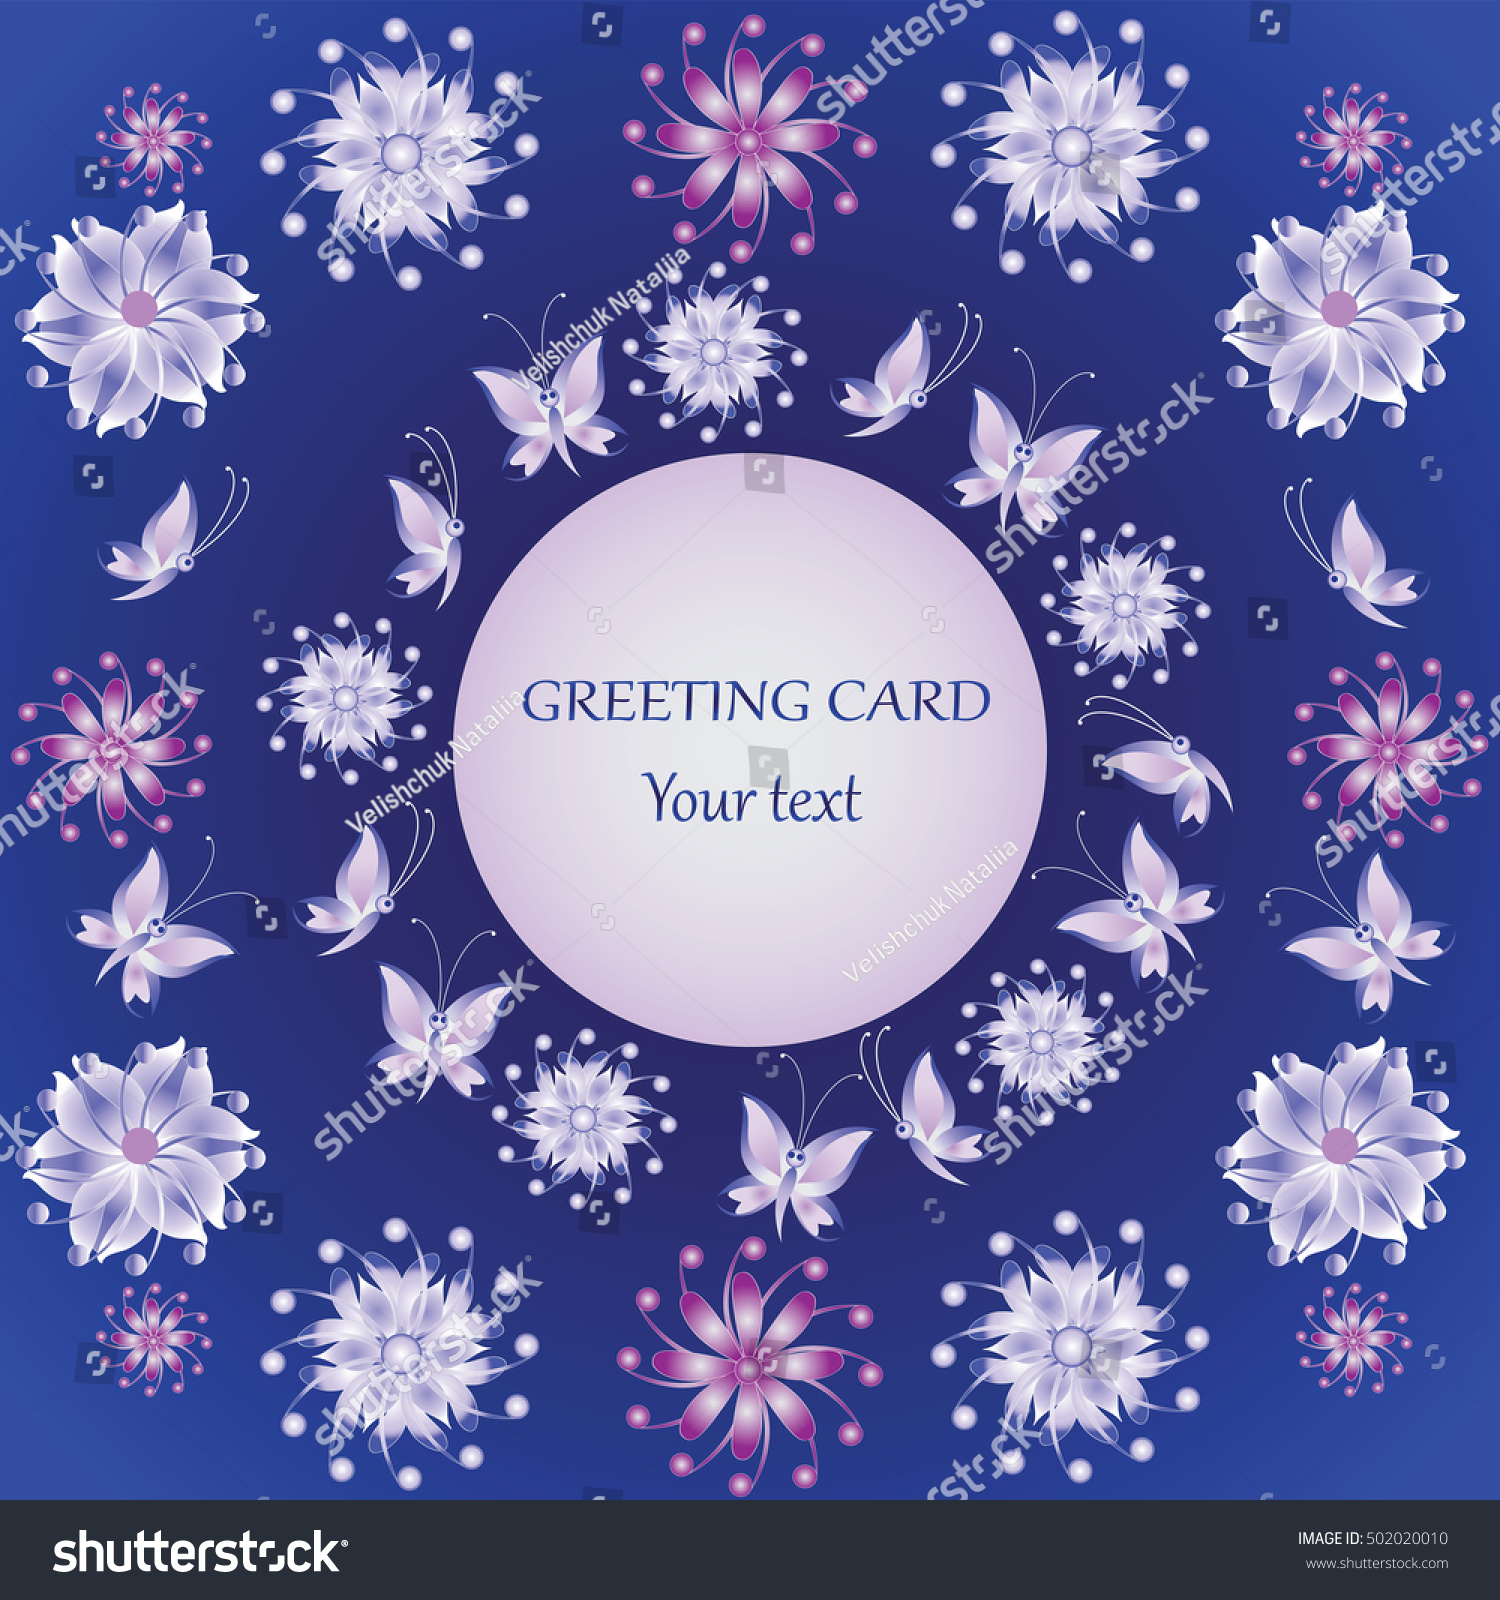 Winter Flowers Greeting Card Design Greetings Stock Vector Royalty